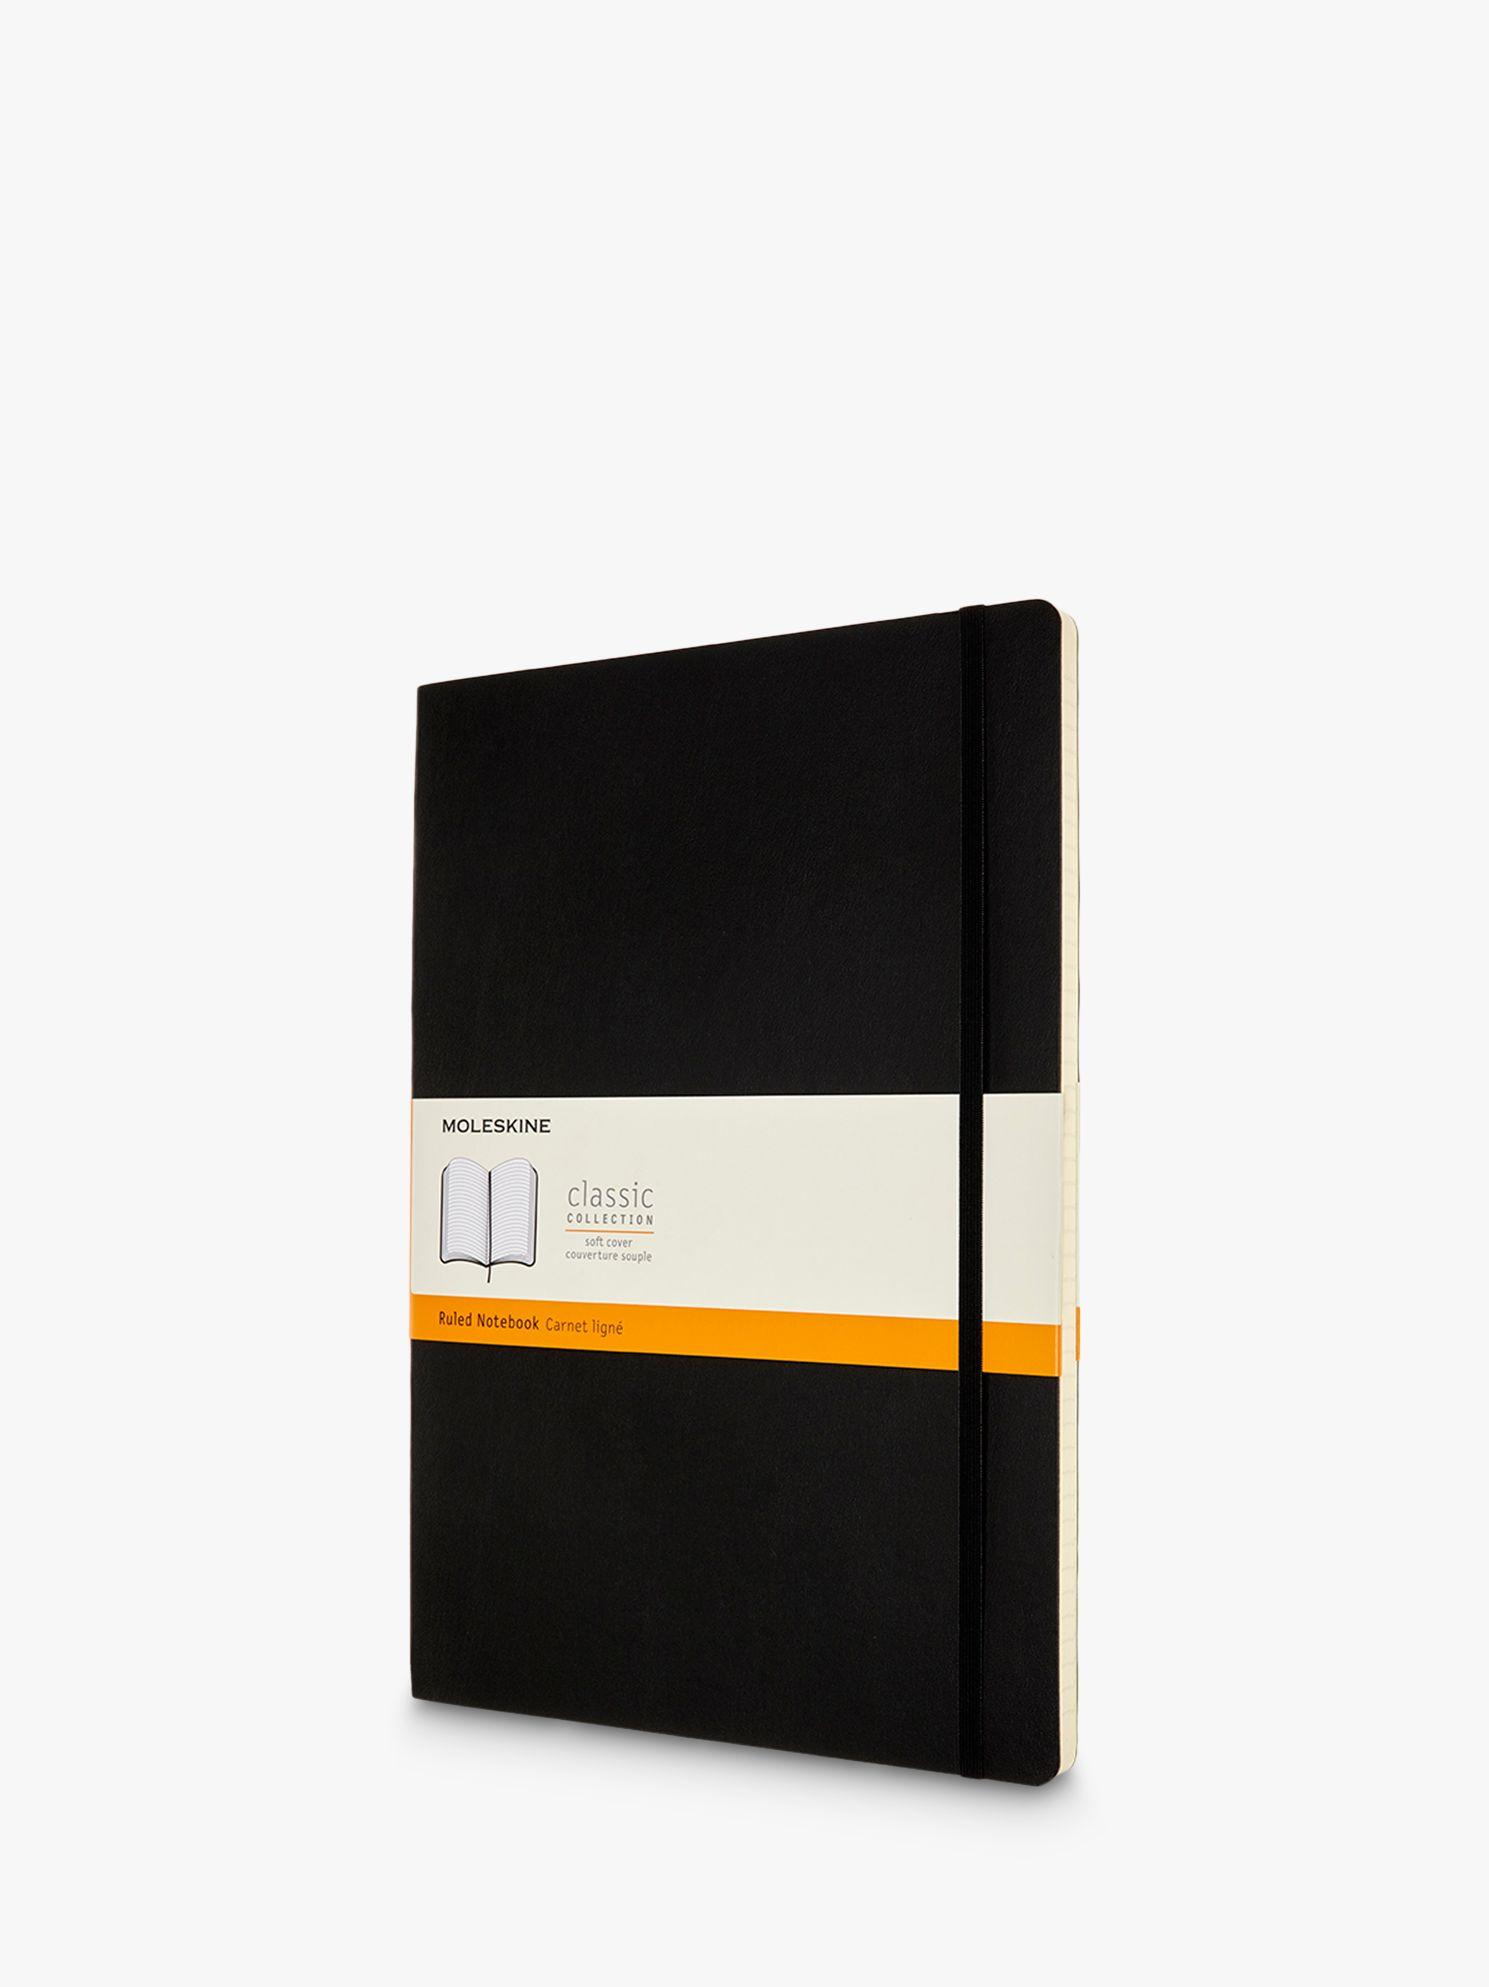 Moleskine Moleskine A4 Soft Cover Ruled Notebook, Black